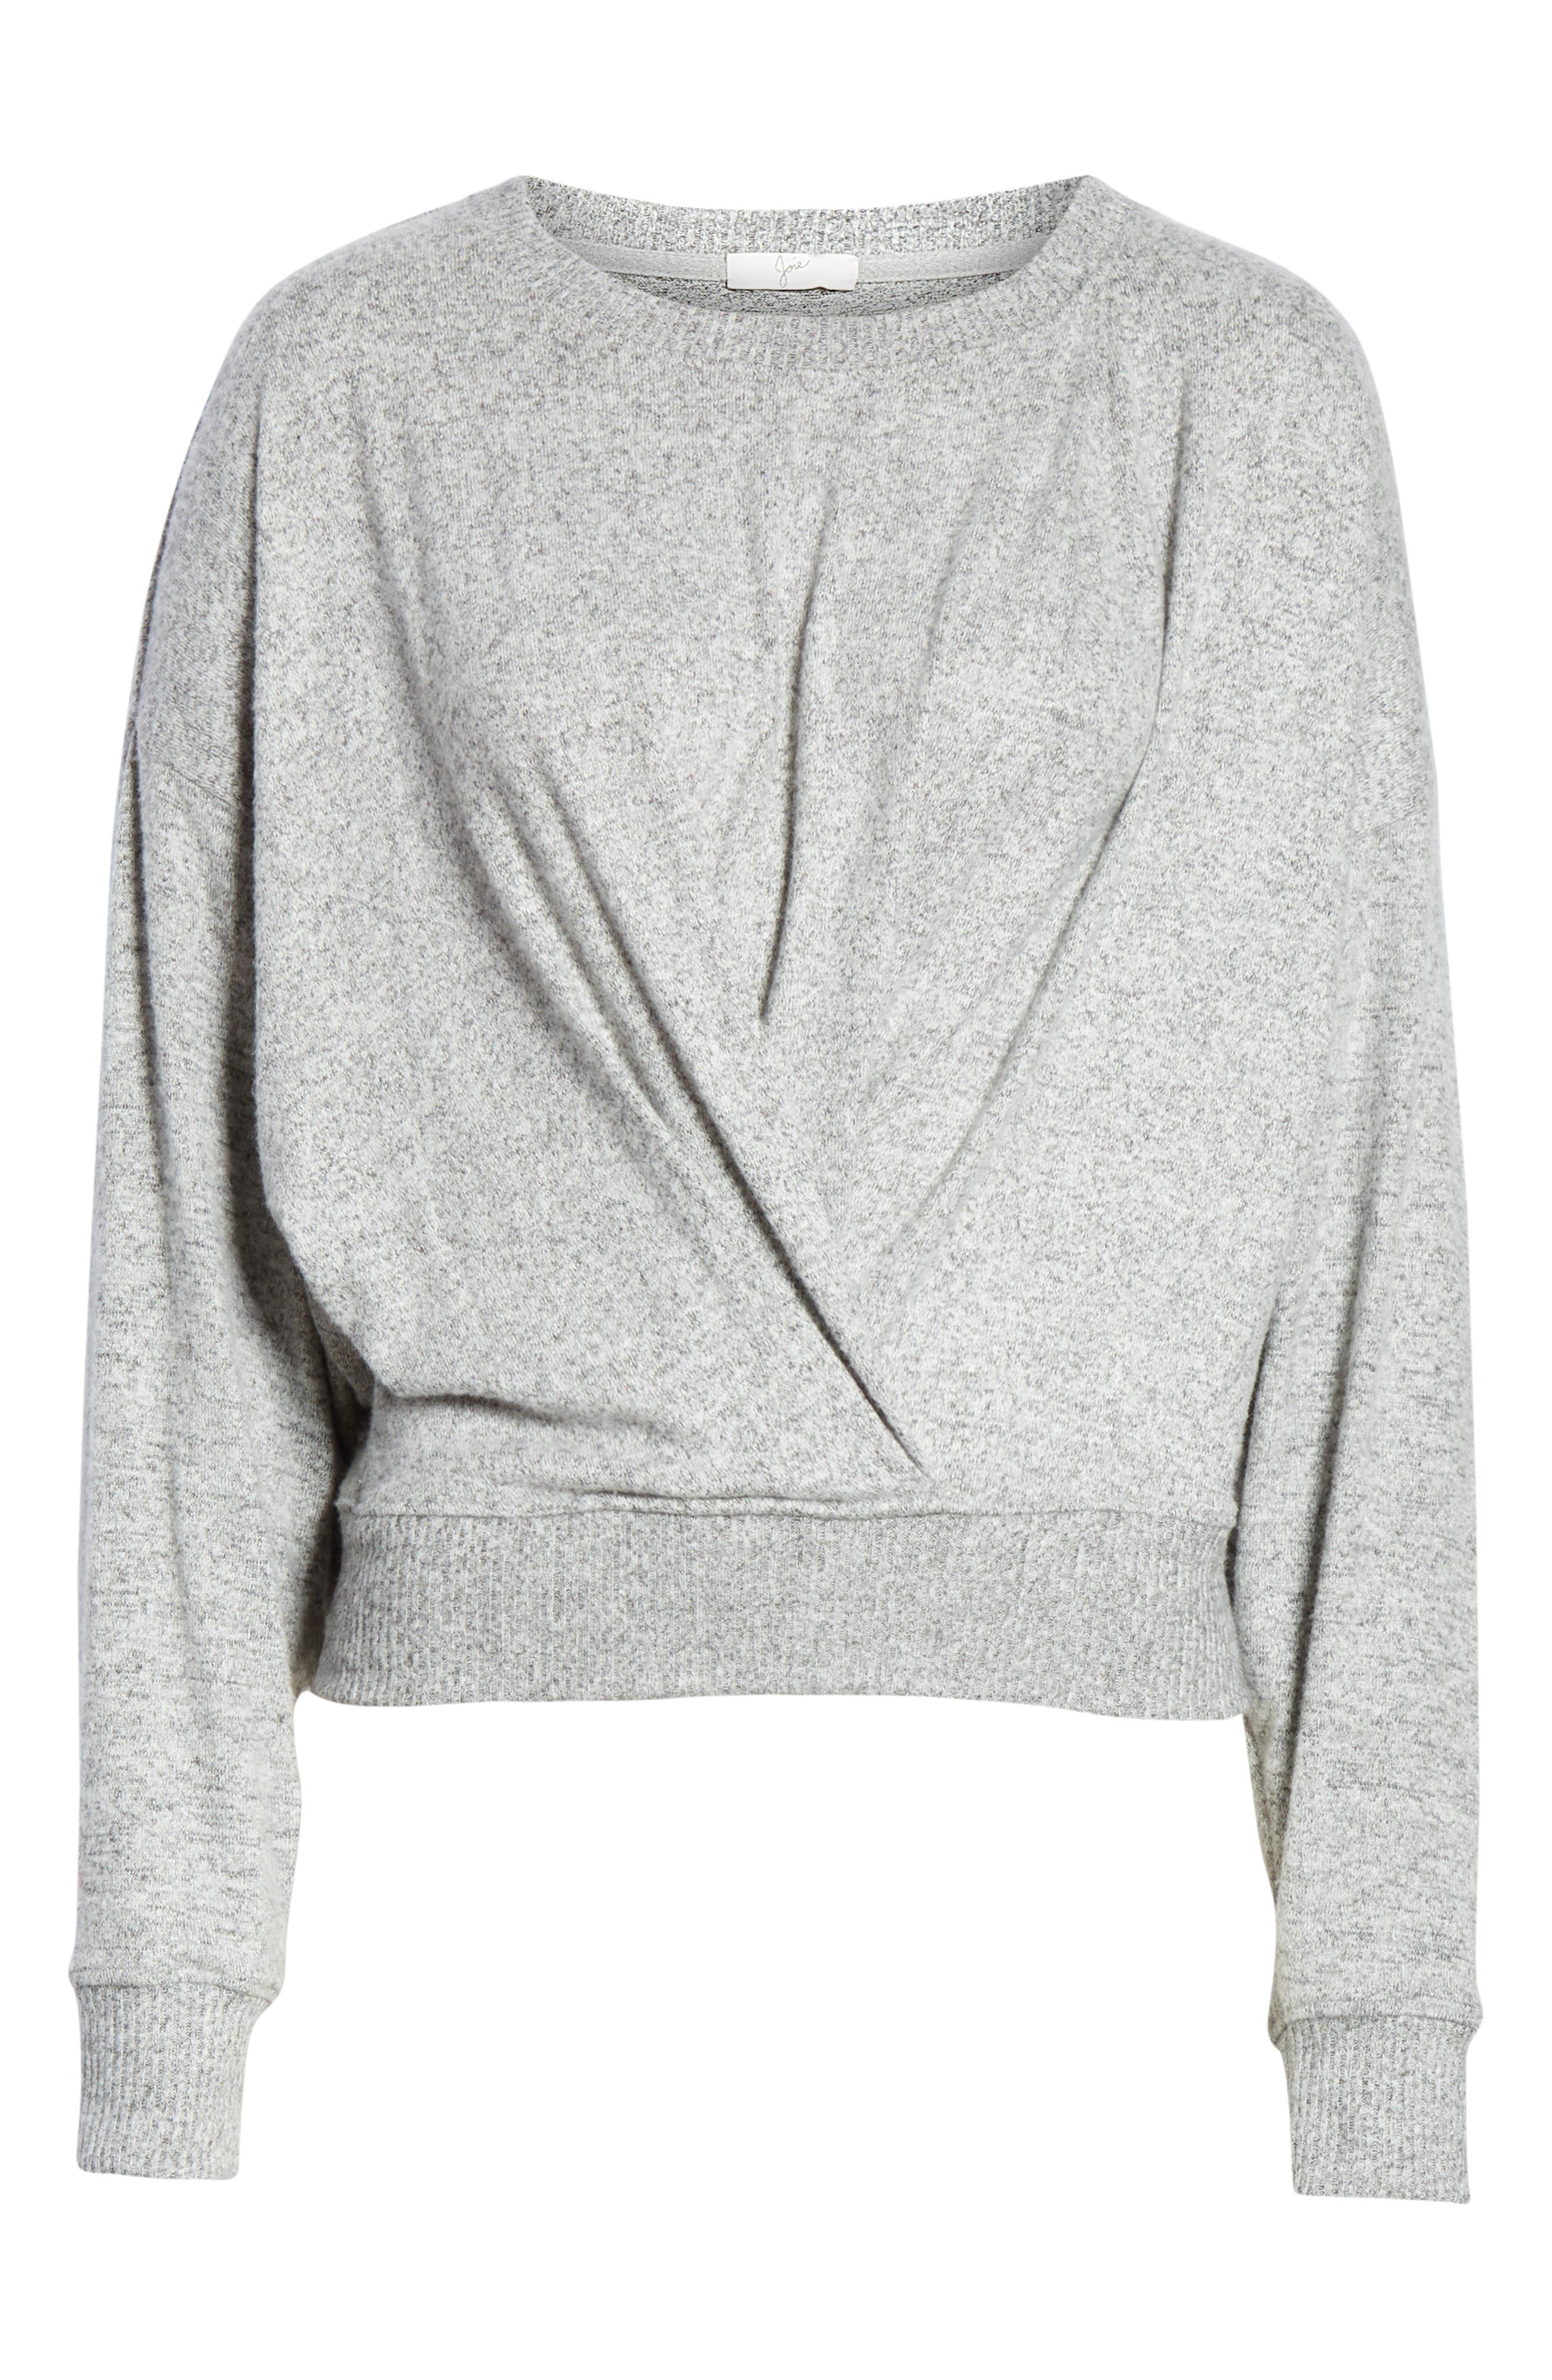 JOIE, Yerrick Sweater, Alternate thumbnail 6, color, 030